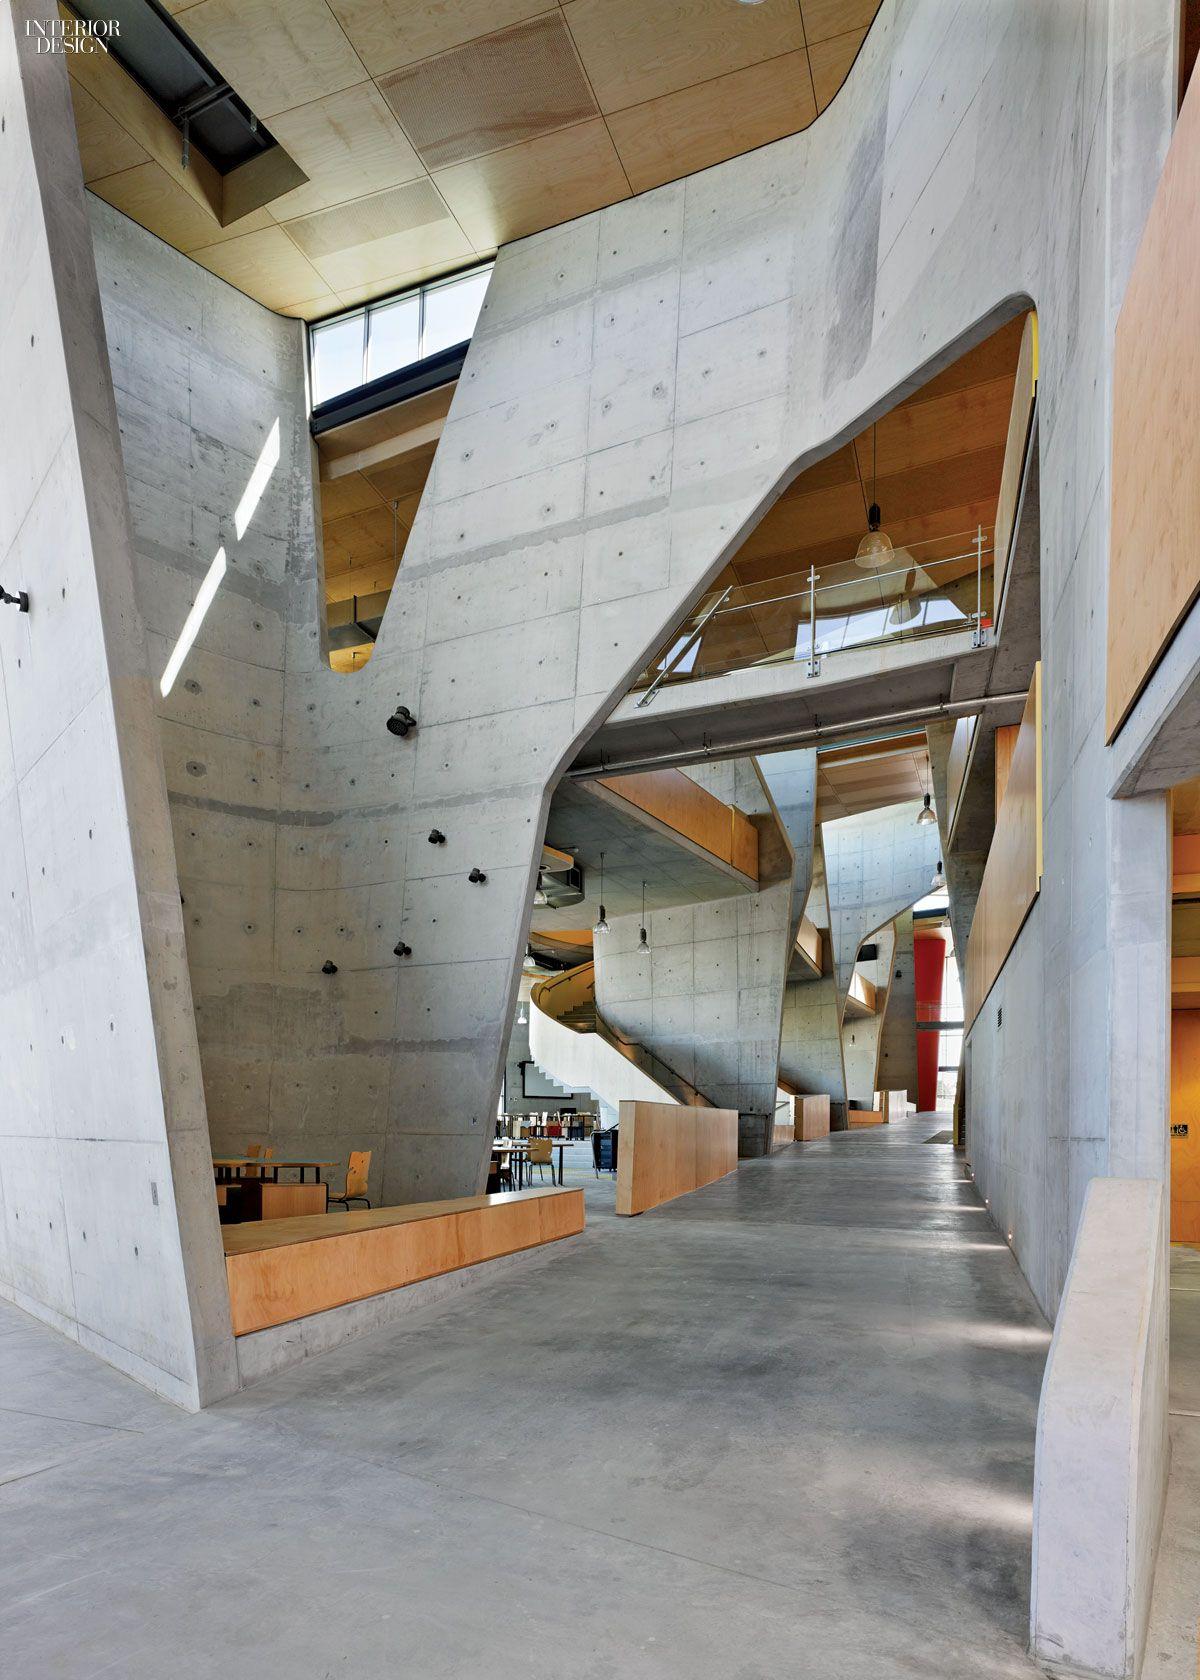 Architecture School Studio ripple effect: crab studio designs queensland architecture school